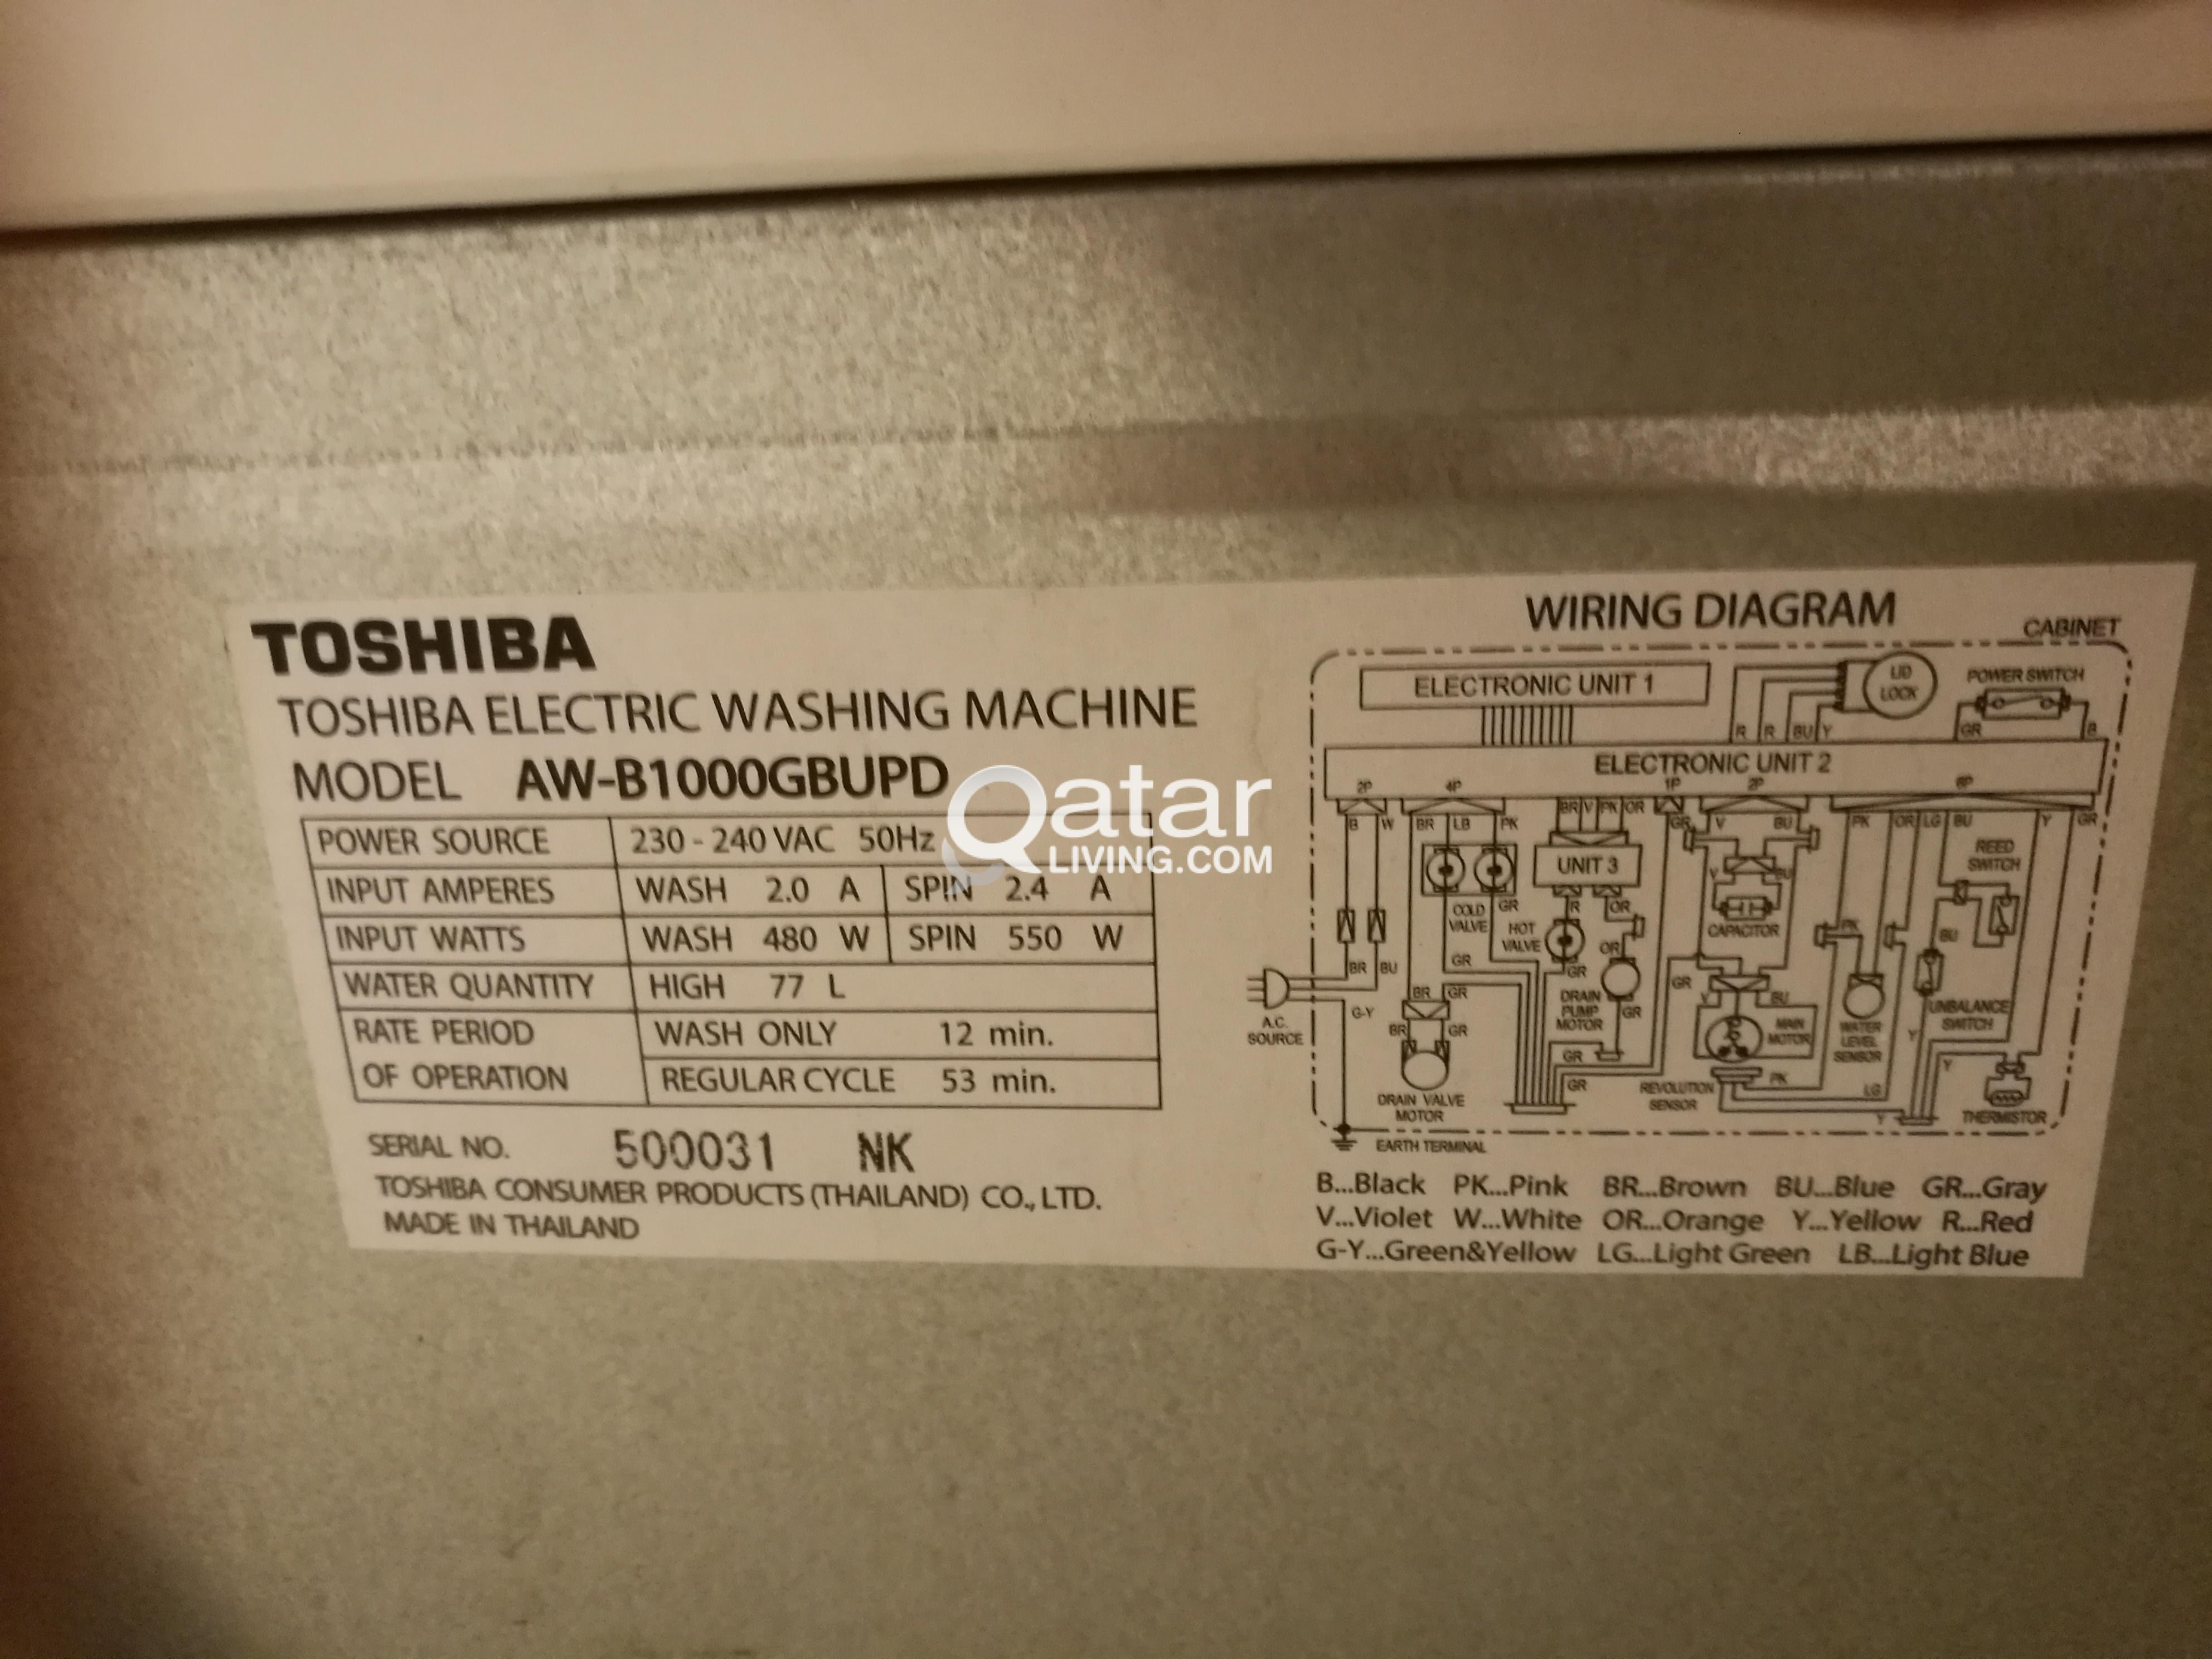 Toshiba Washing Machine Wiring Diagram Library Title Information